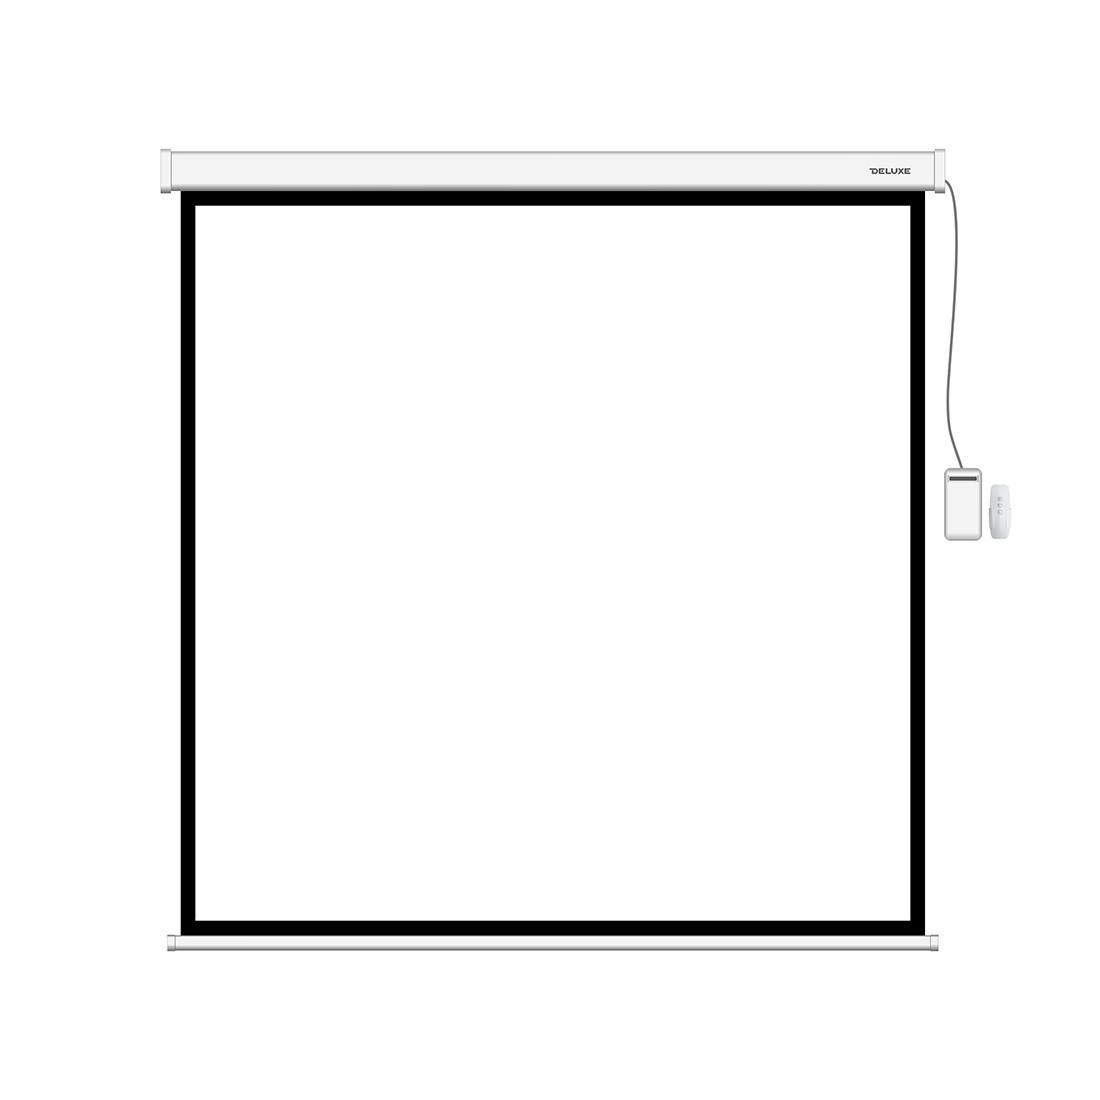 Экран для проекторов Deluxe DLS-ERC203x153W Моторизированный 195x145 Matt white Белый